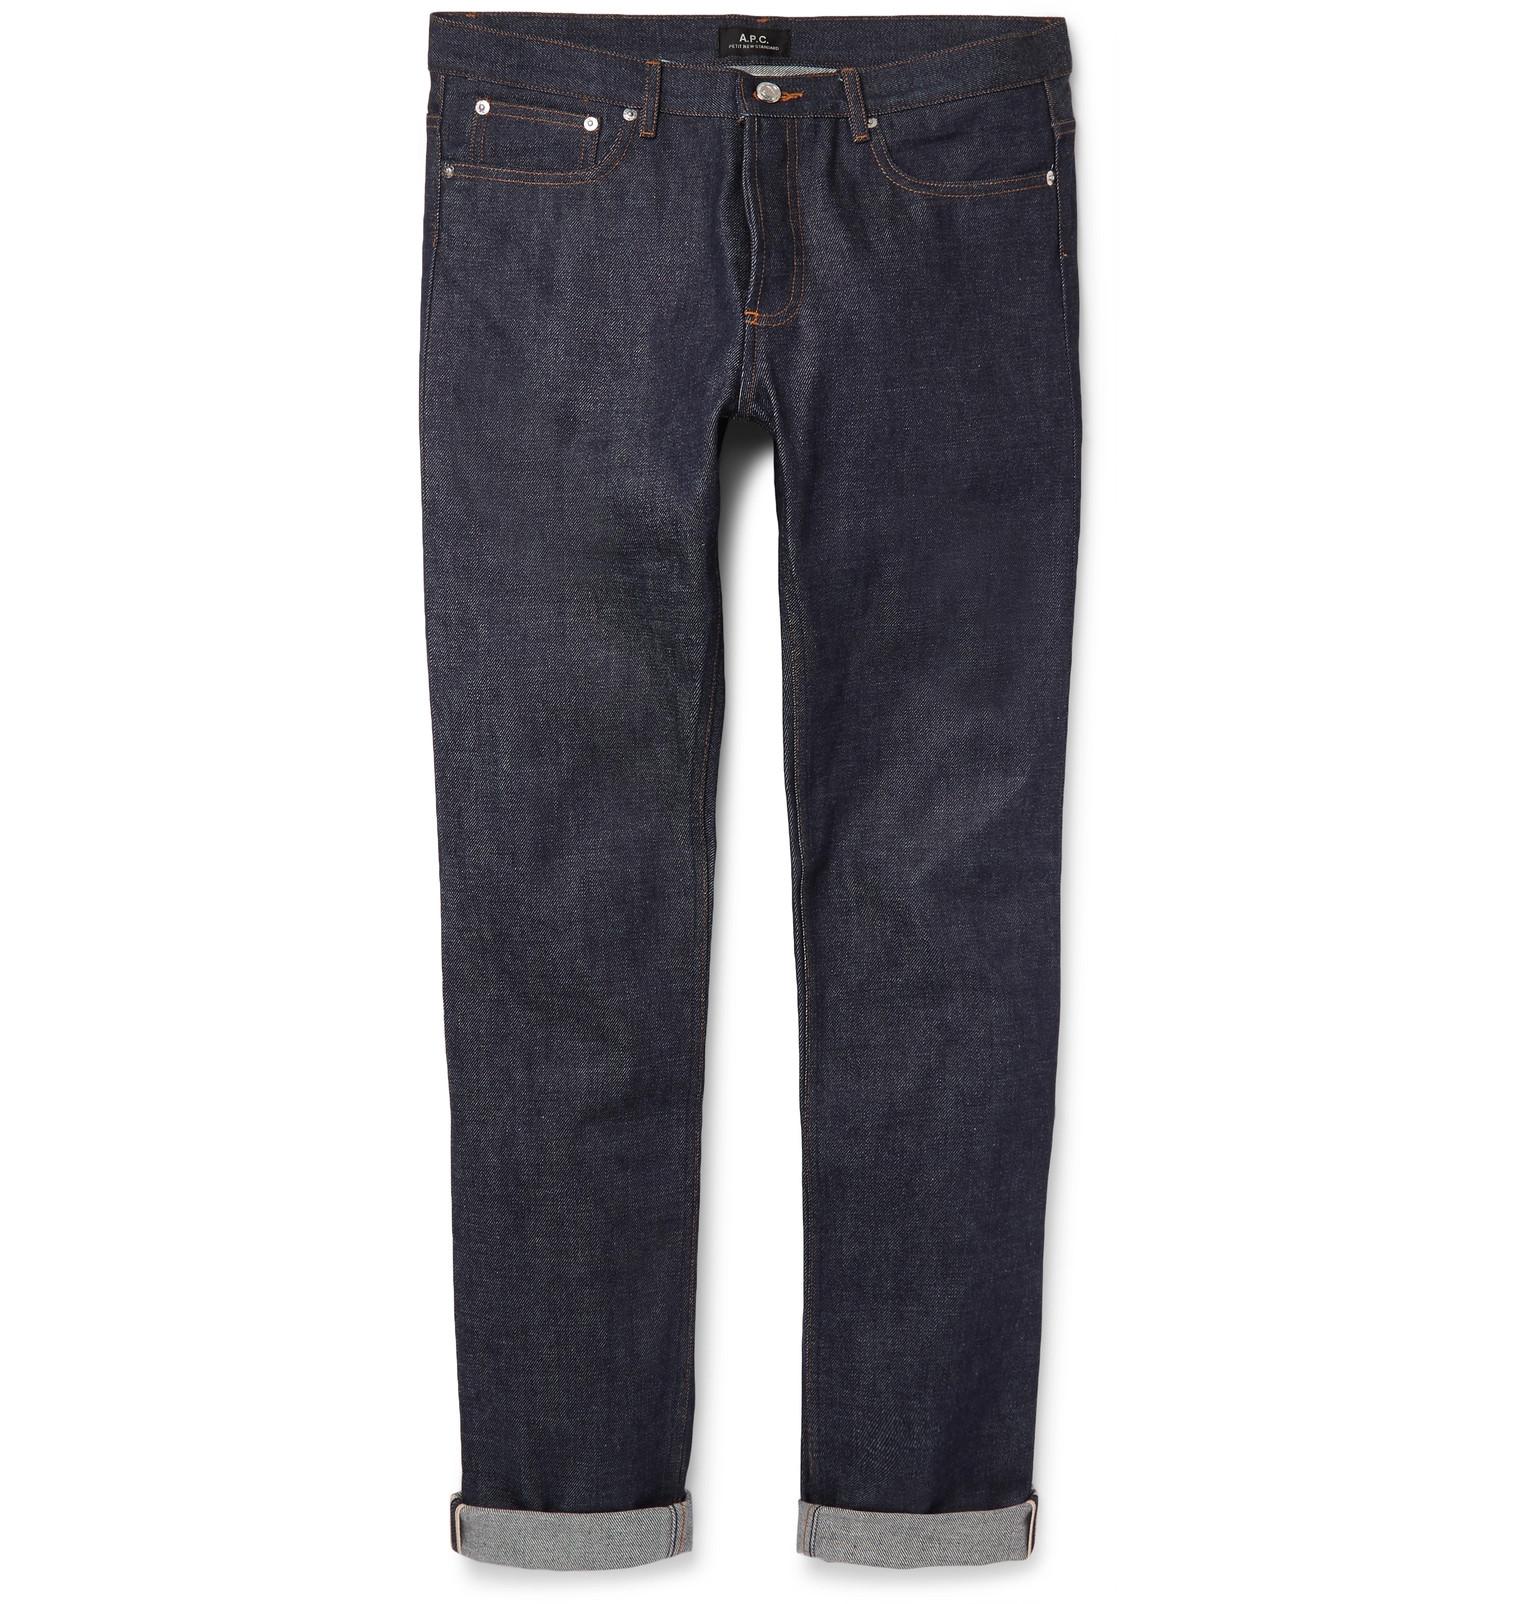 A.P.C. - Petit New Standard Skinny-Fit Dry Selvedge Denim Jeans